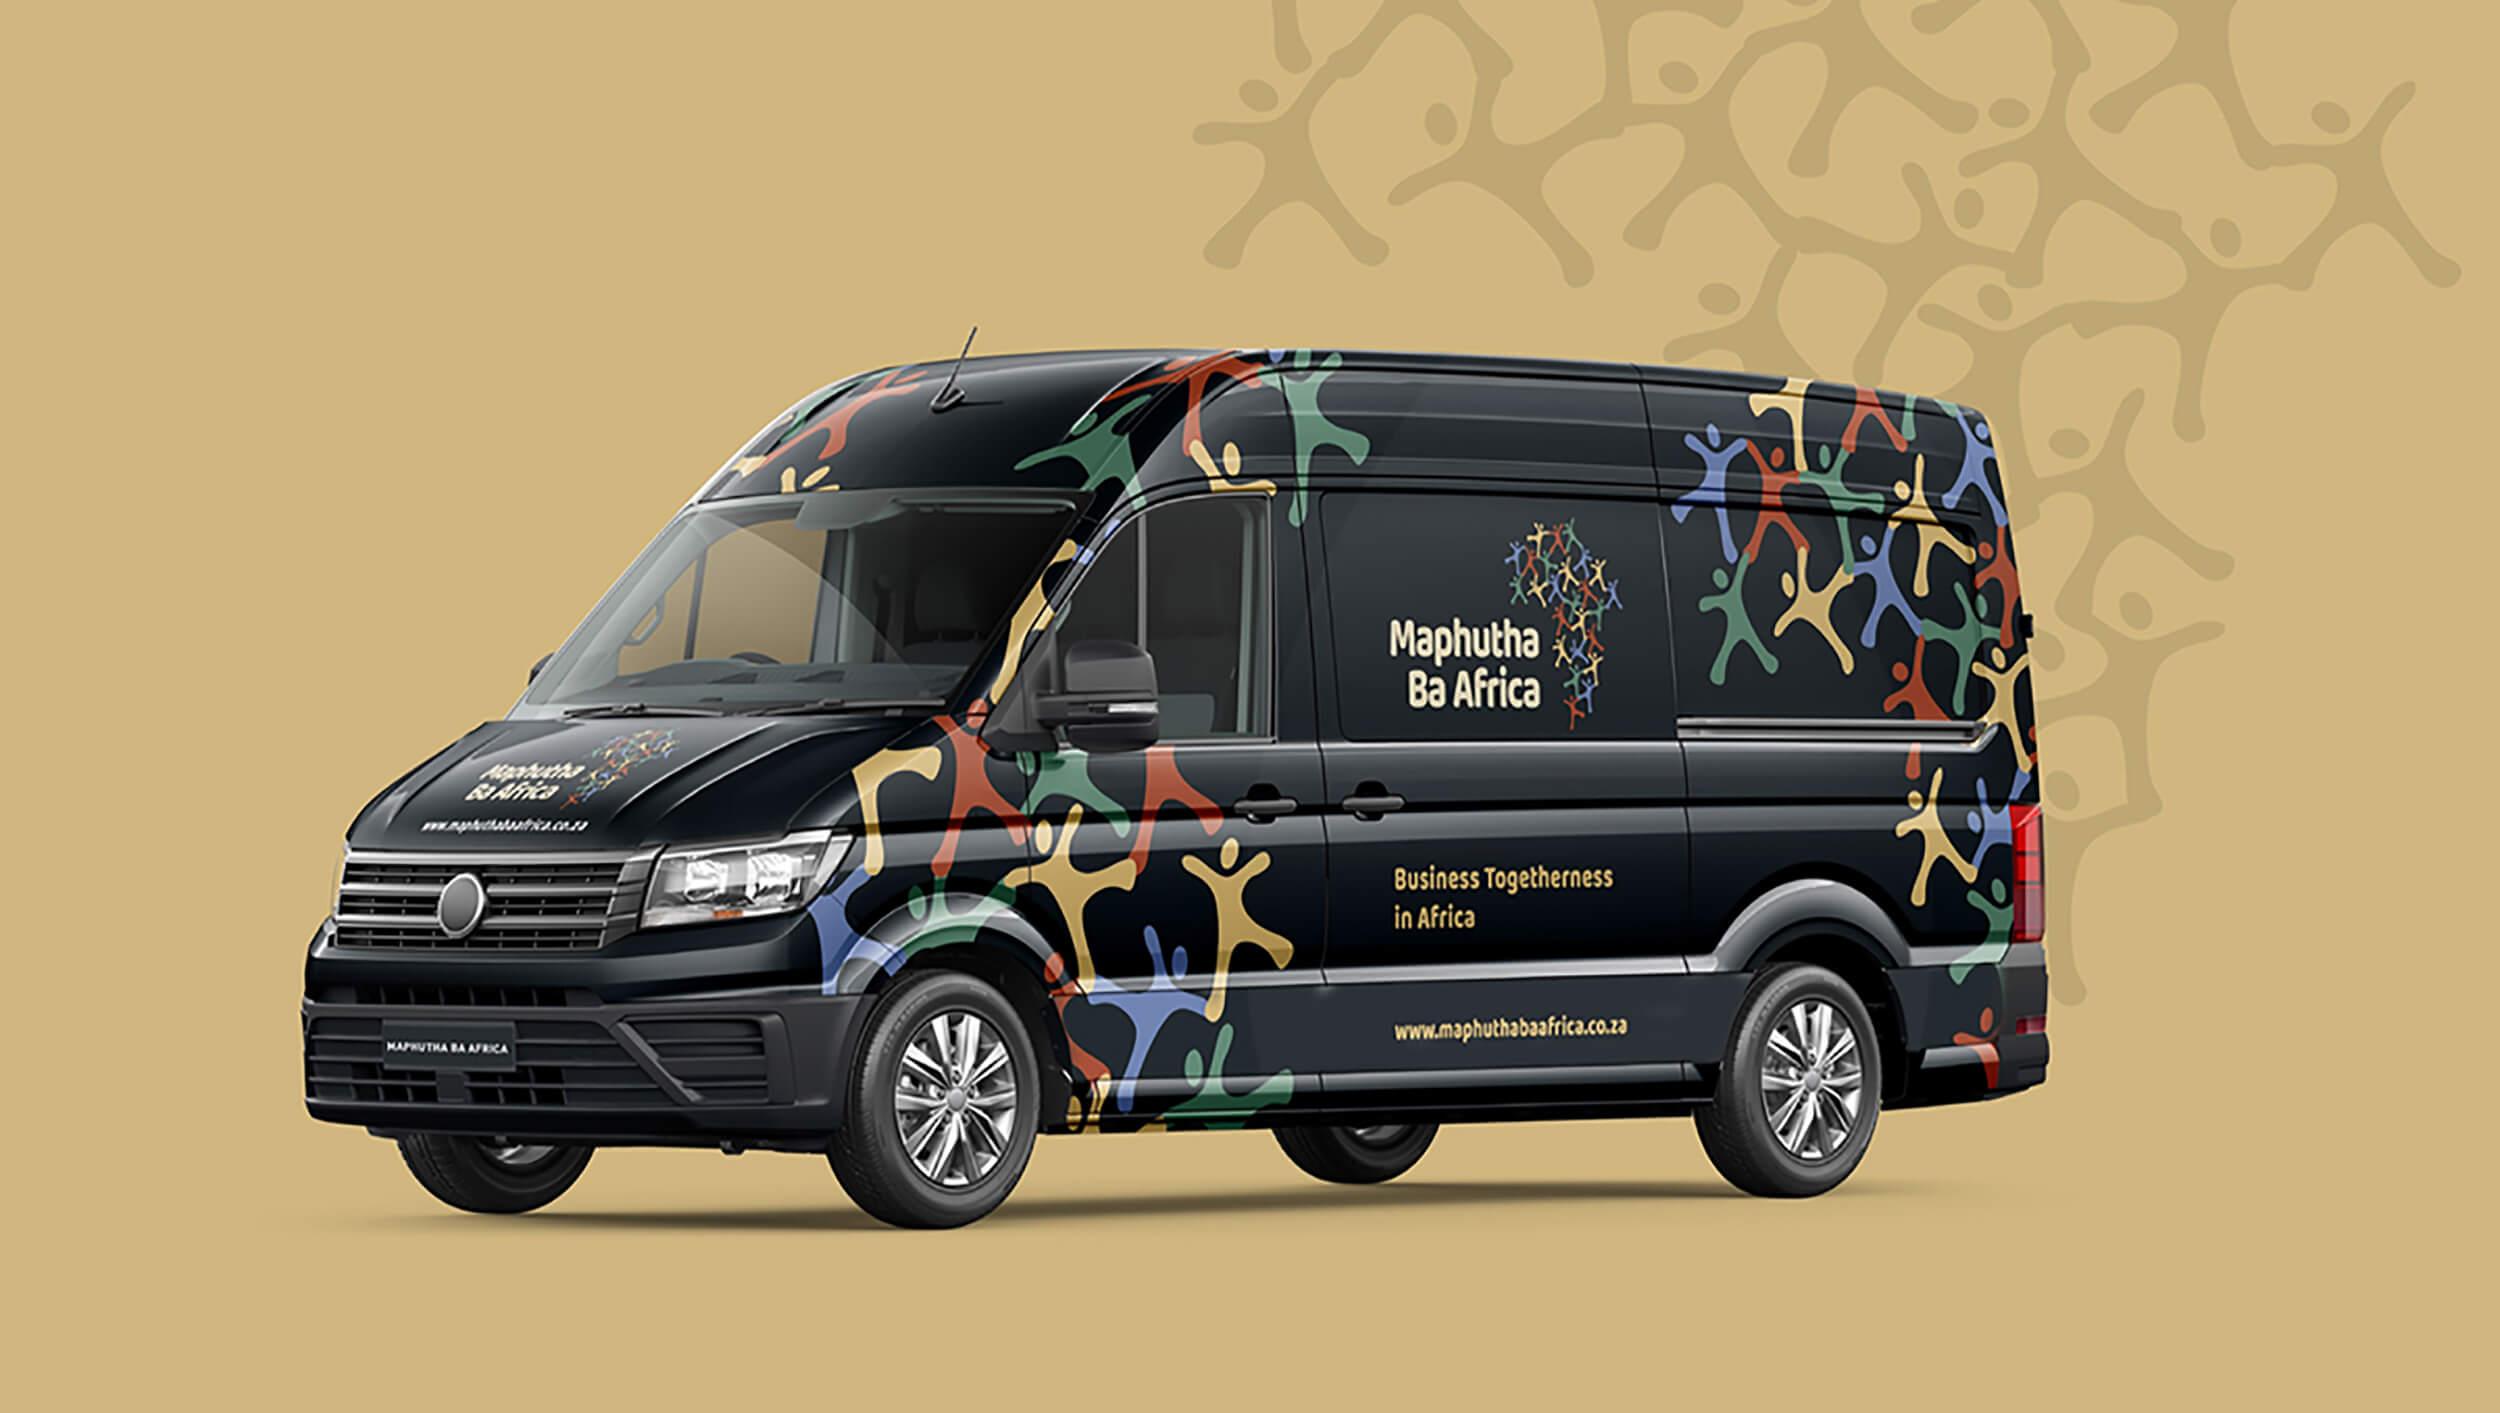 maphutha-ba-africa-vehicle-branding-wrap-graphic-designers-agent-orange-design-creatives-johannesburg.jpg